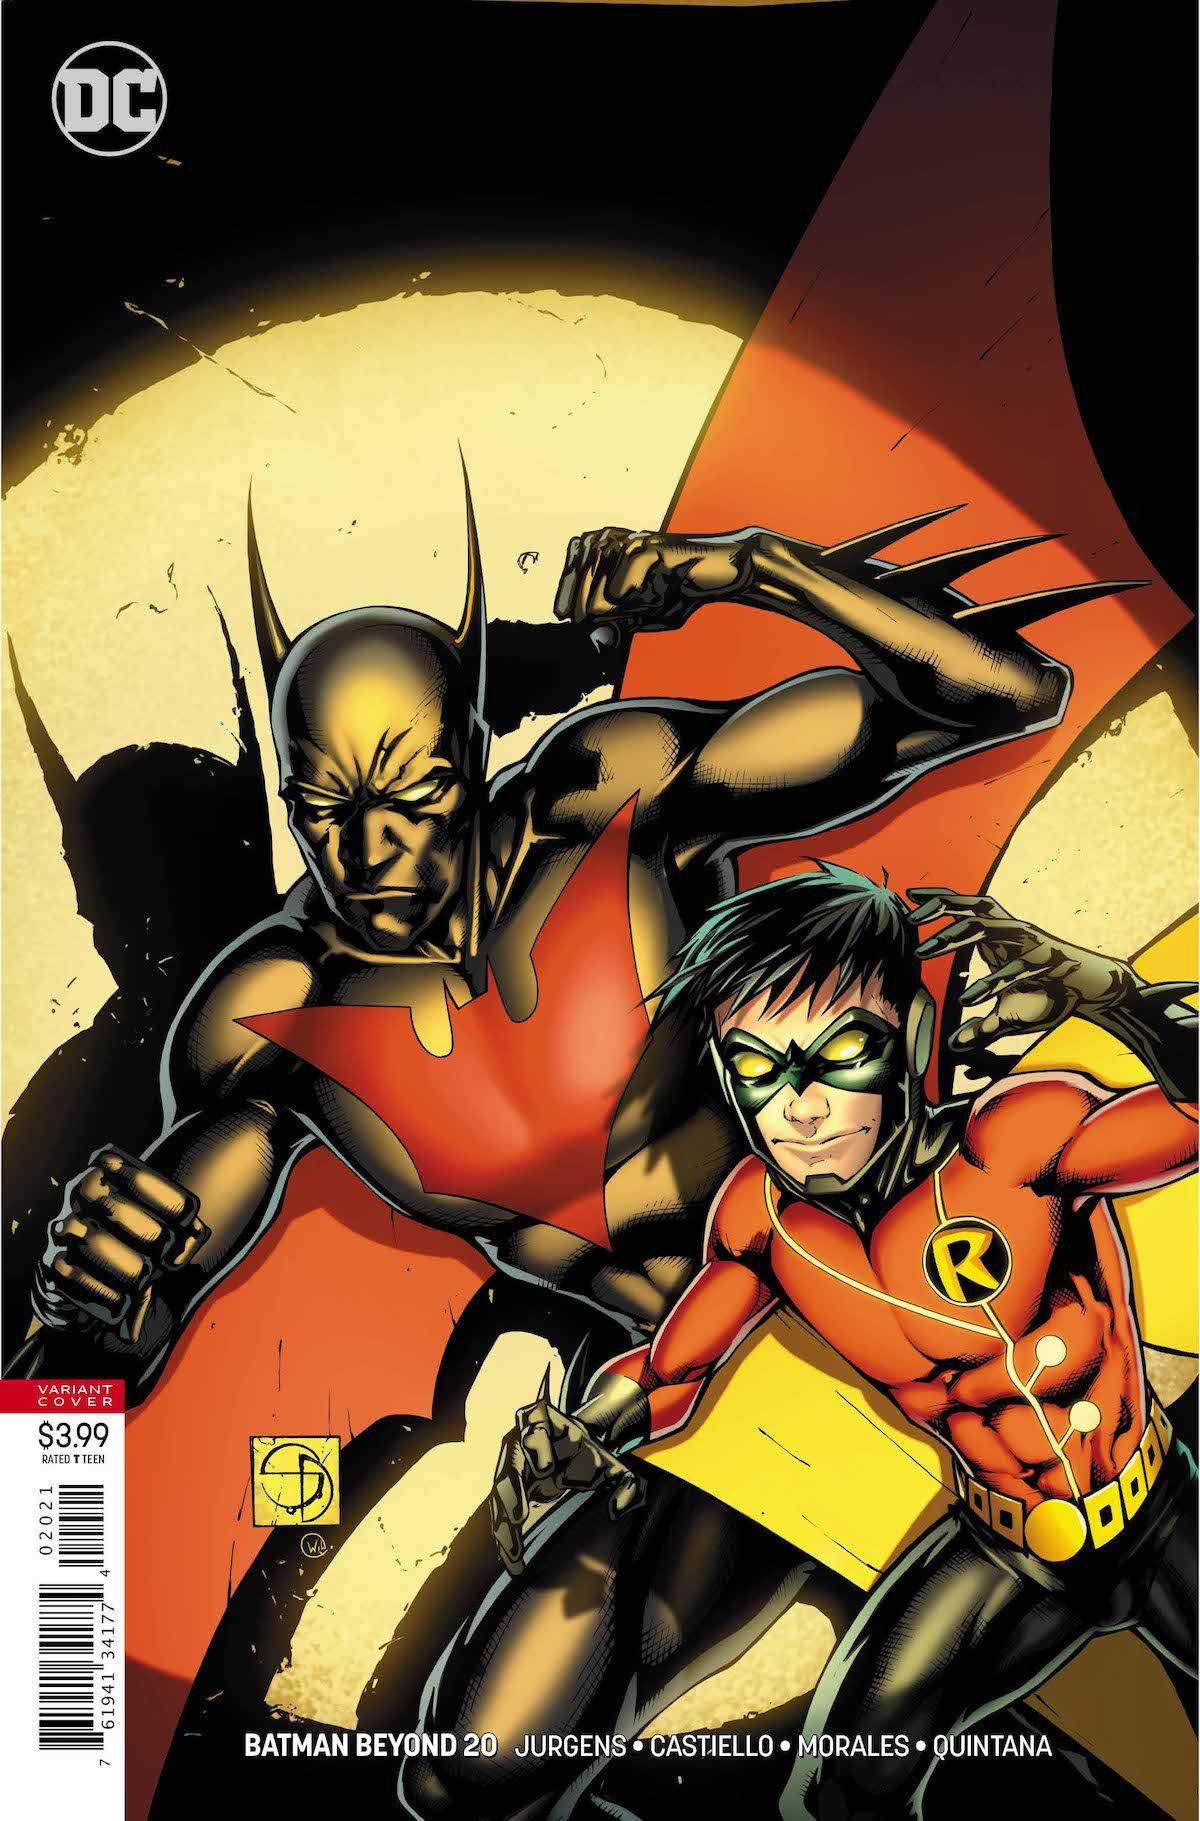 Batman Beyond #20 variant cover